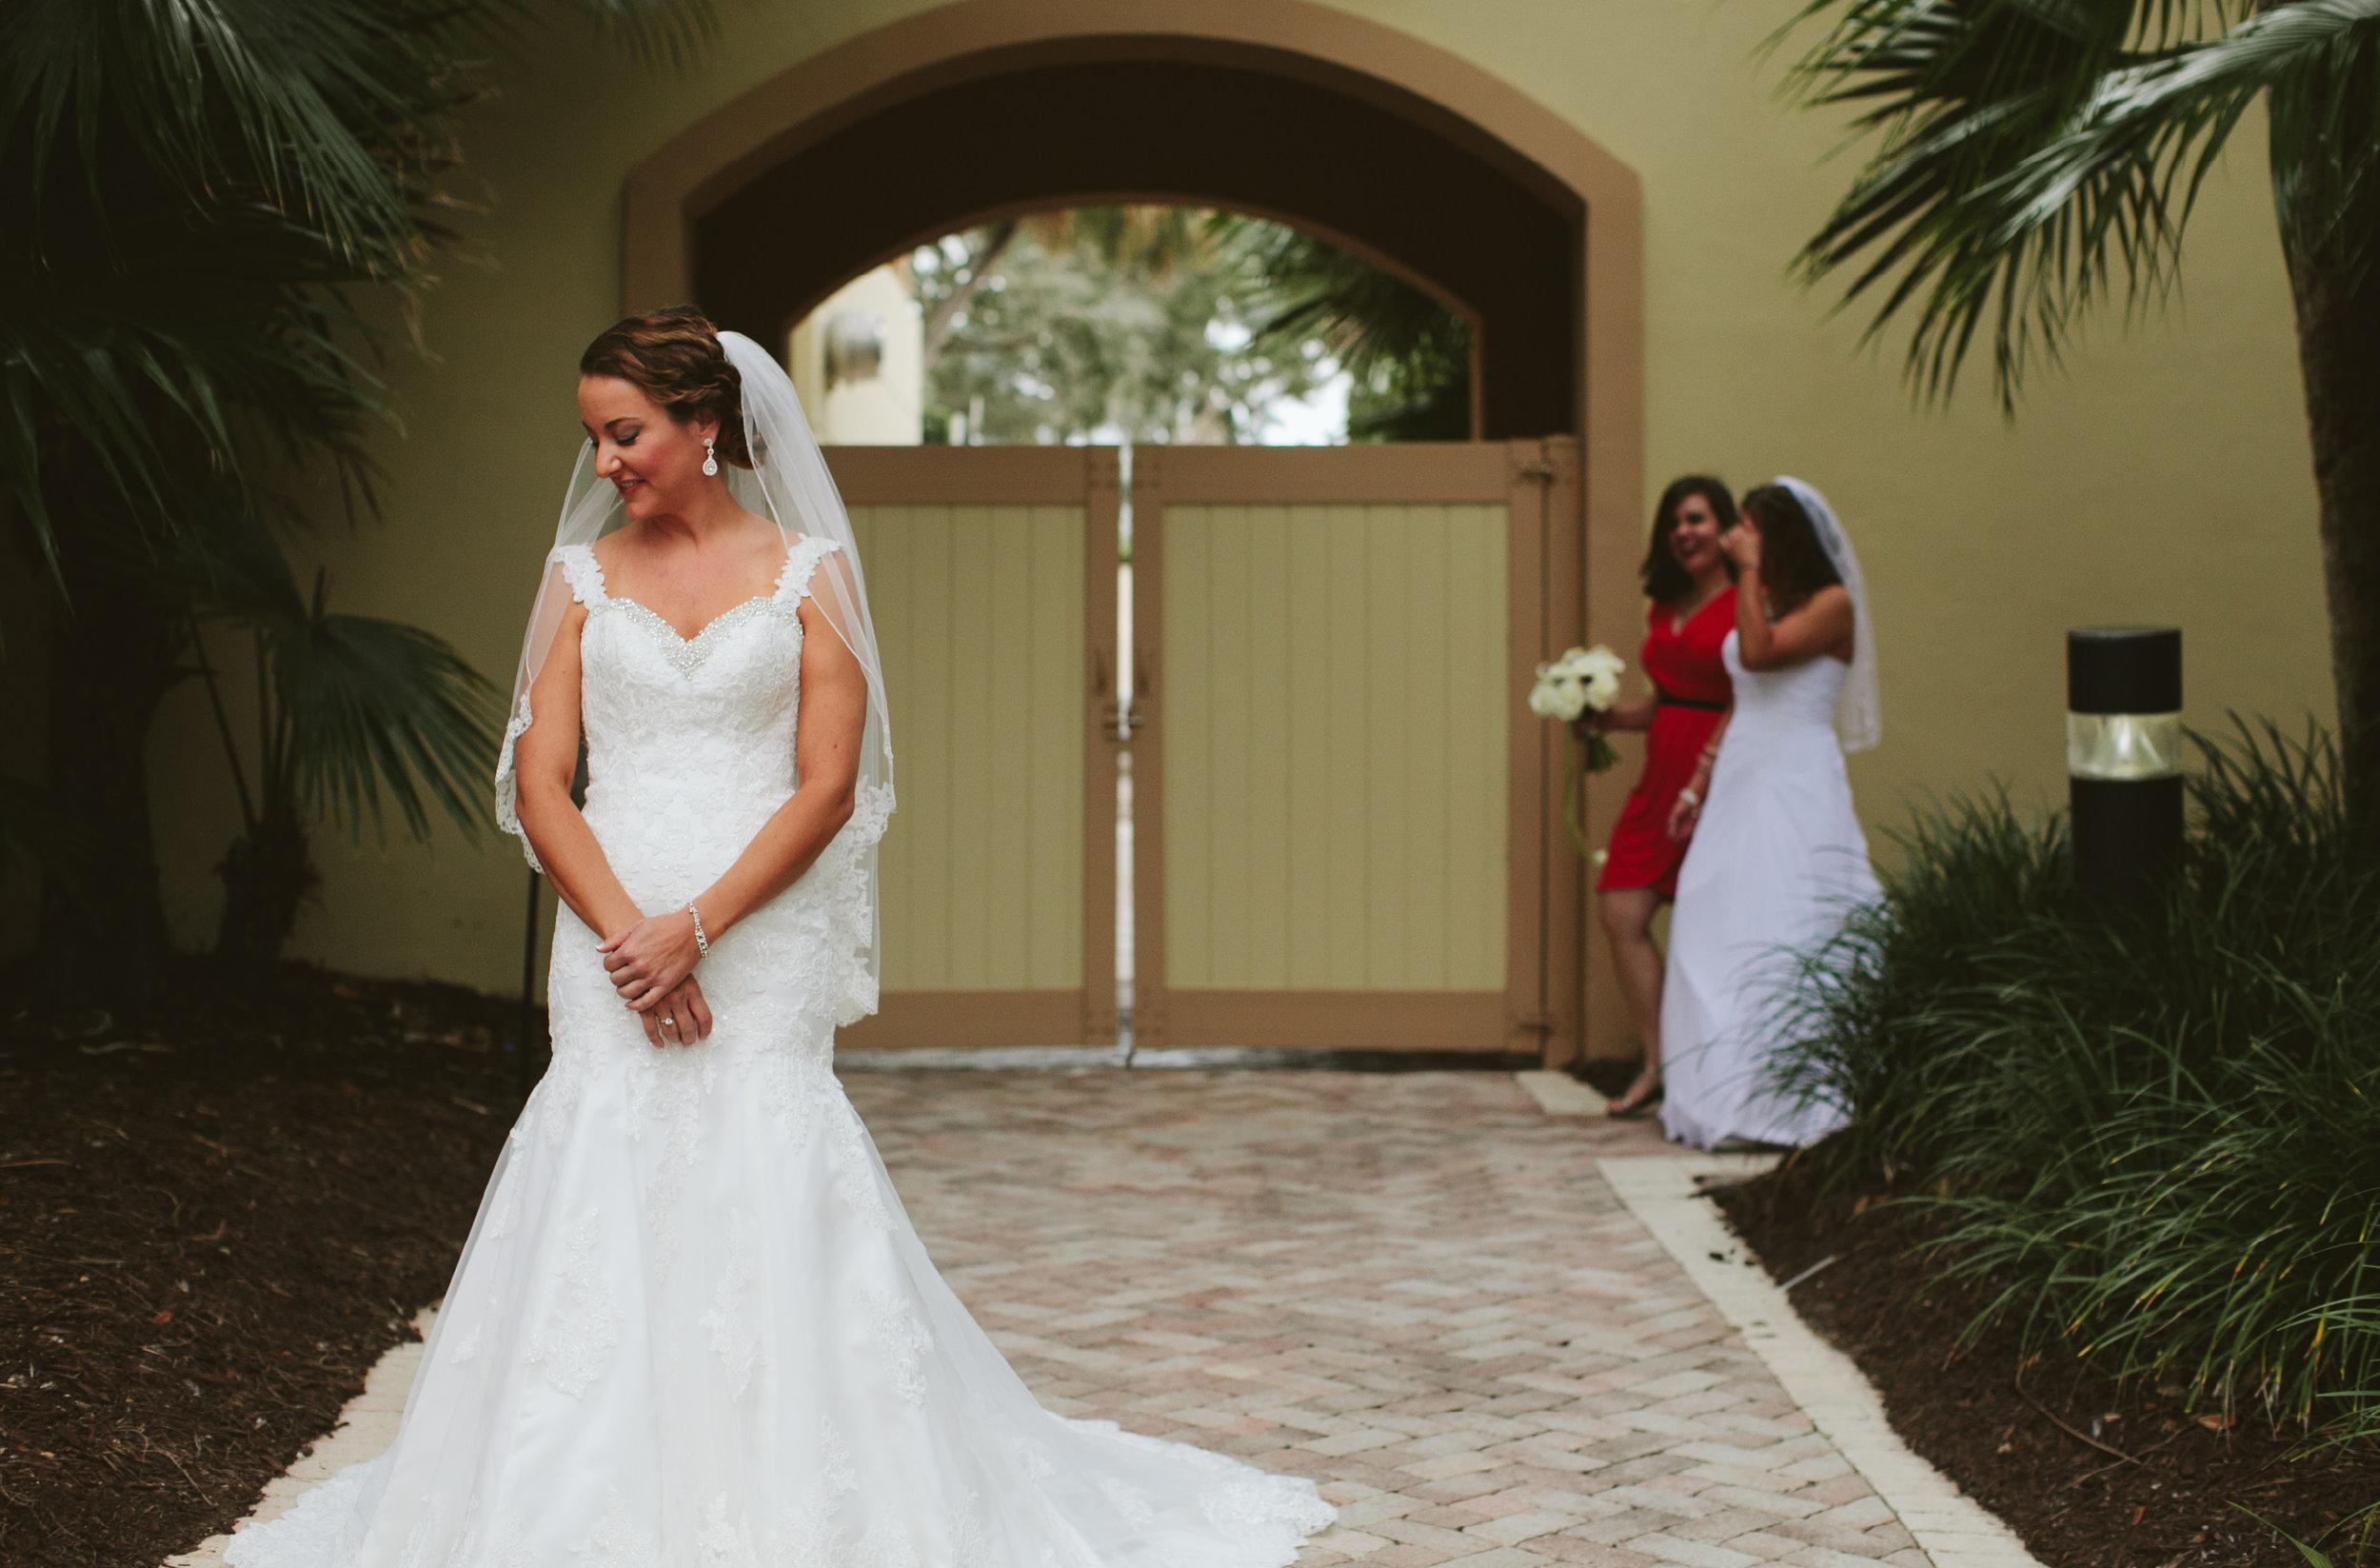 Kim + Monica's Mizner Country Club Wedding in Delray Beach23.jpg